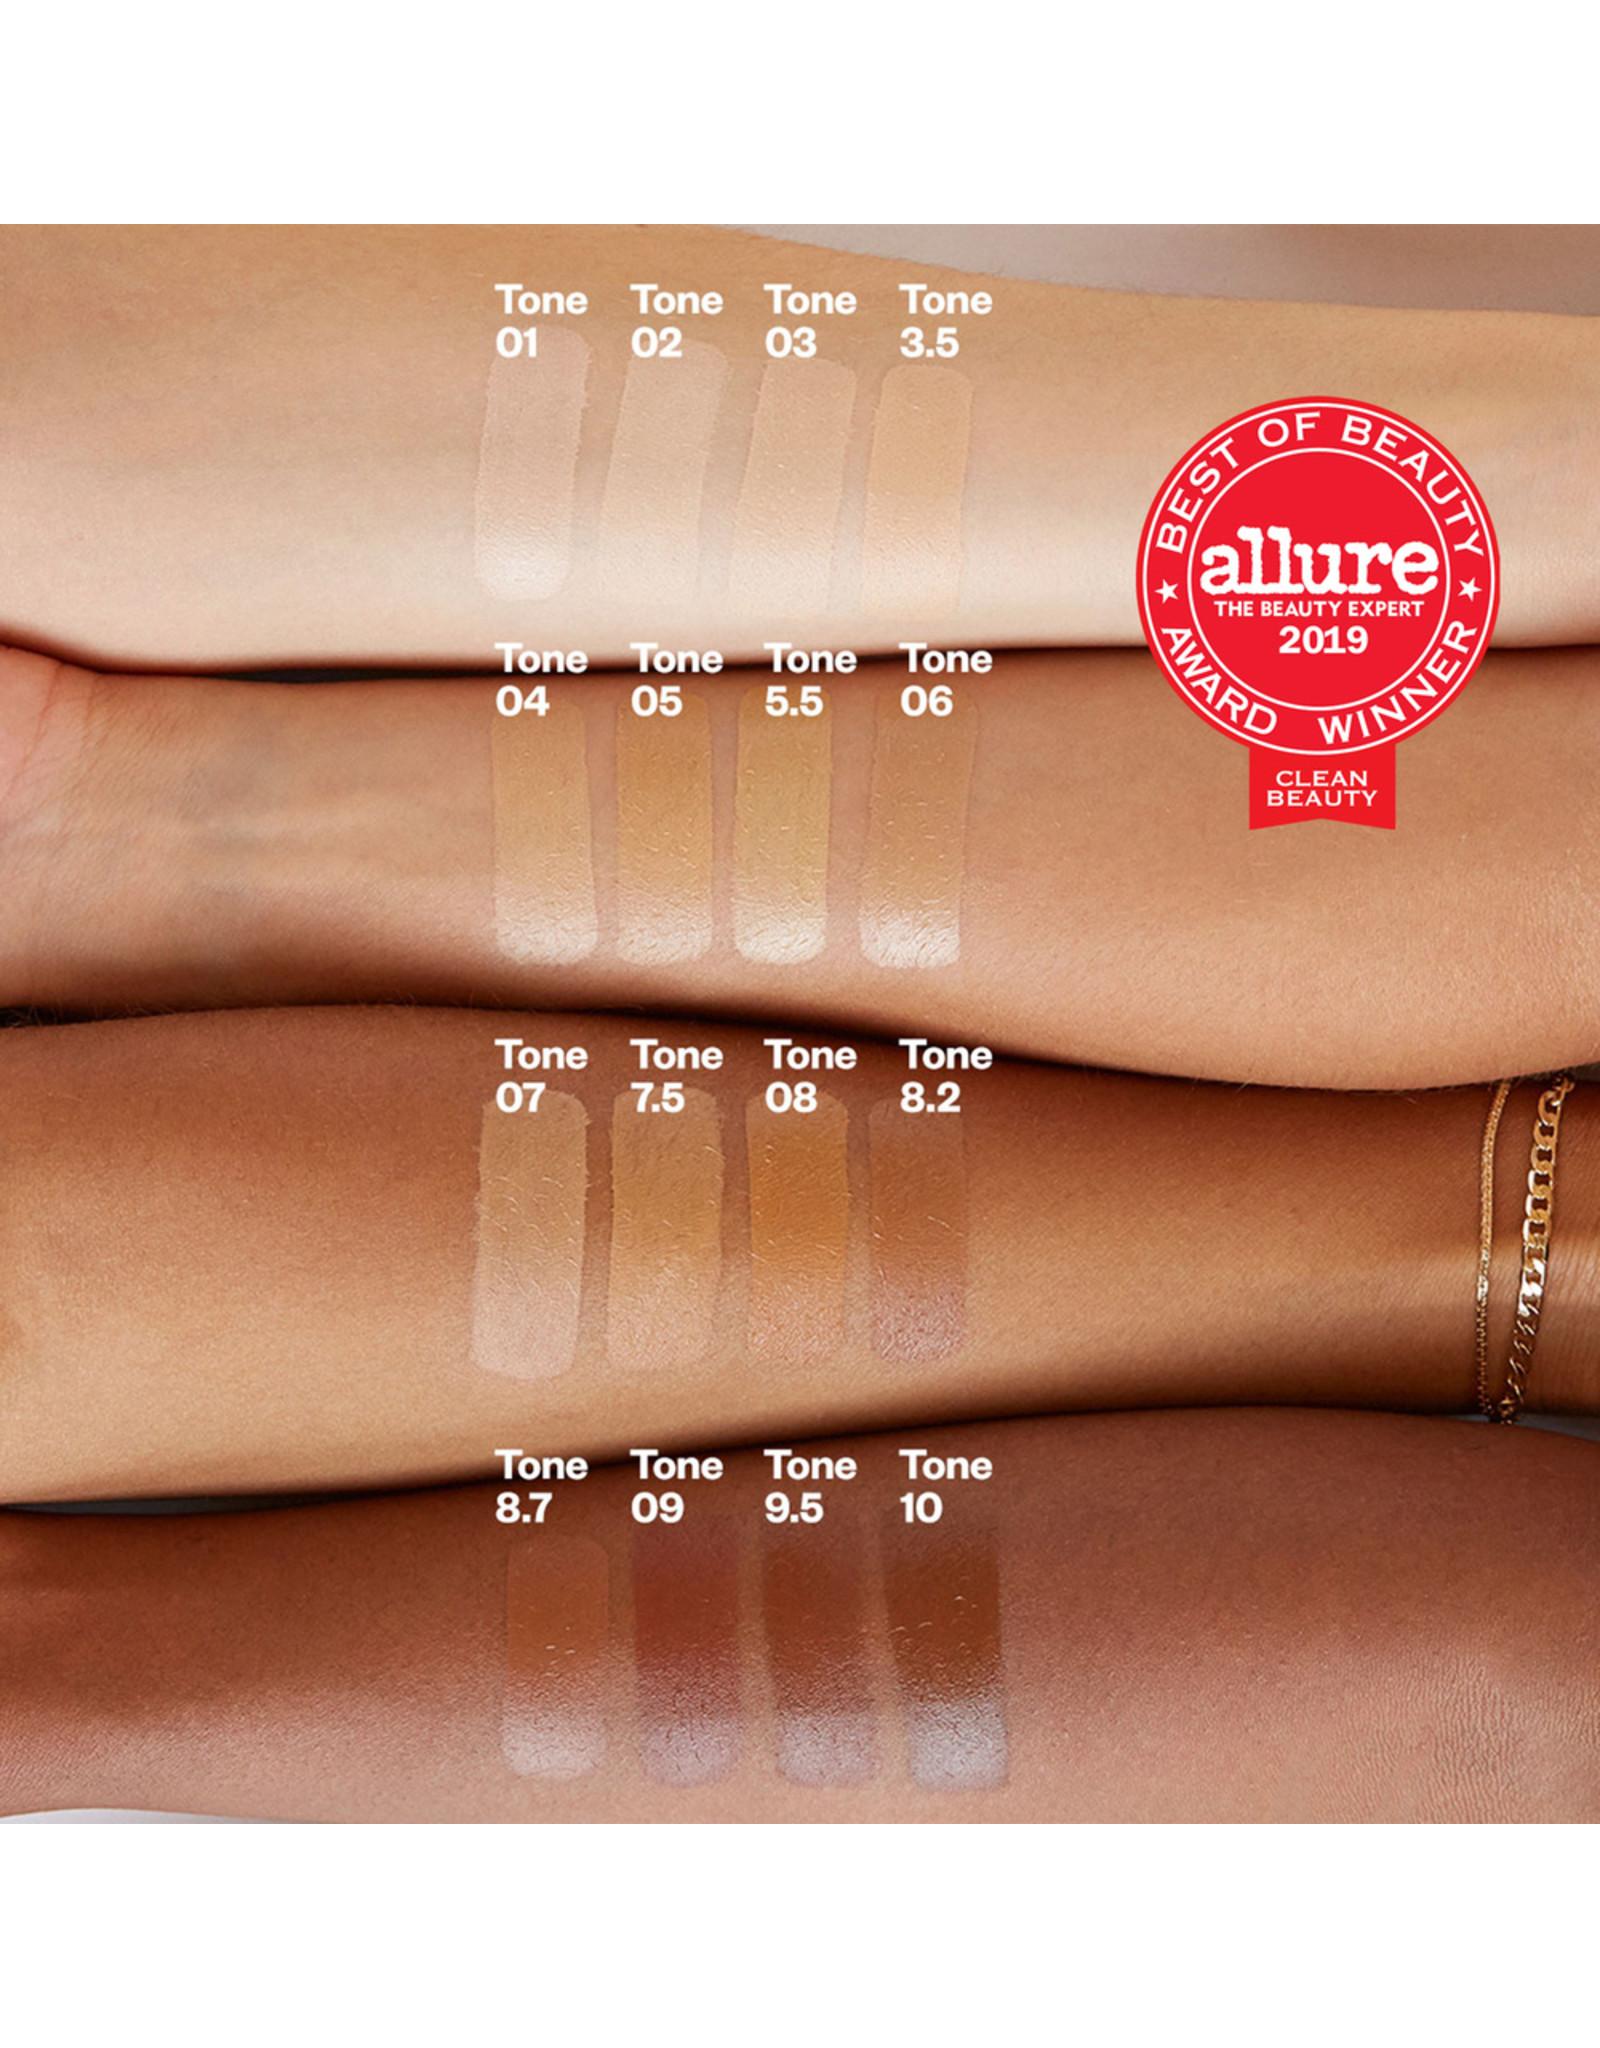 Kosas Kosas Tinted Face Oil (Color: 10)